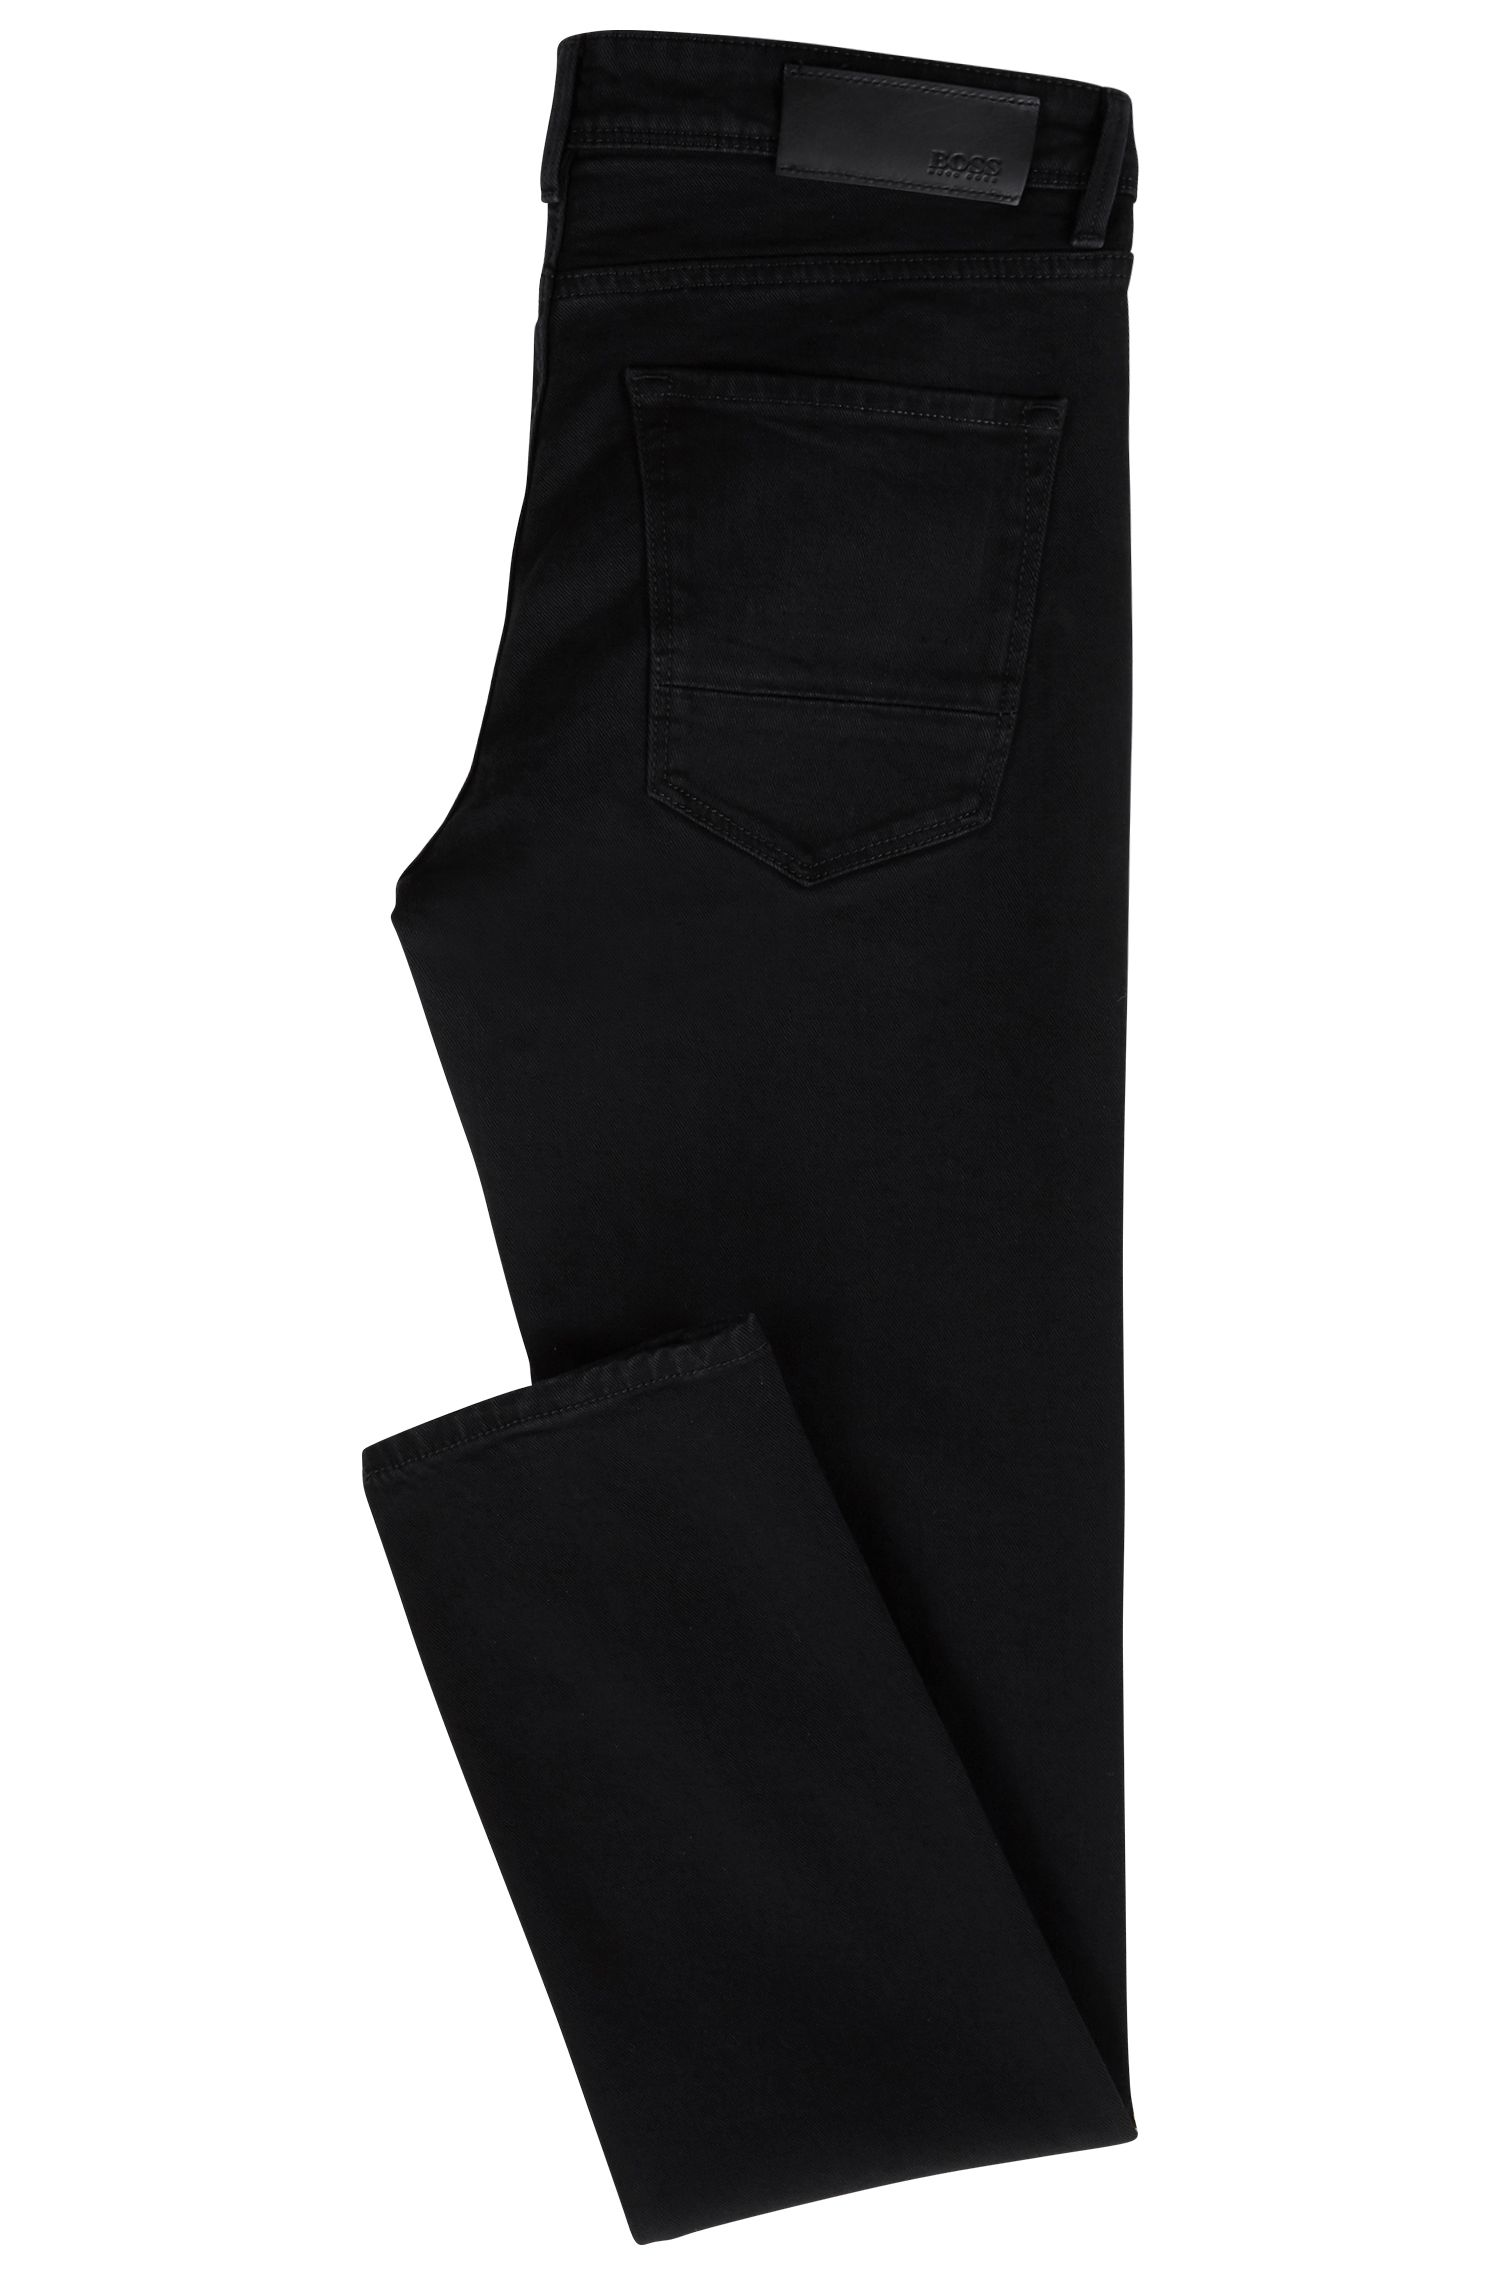 Extra-slim-fit black jeans in Italian stretch denim, Black